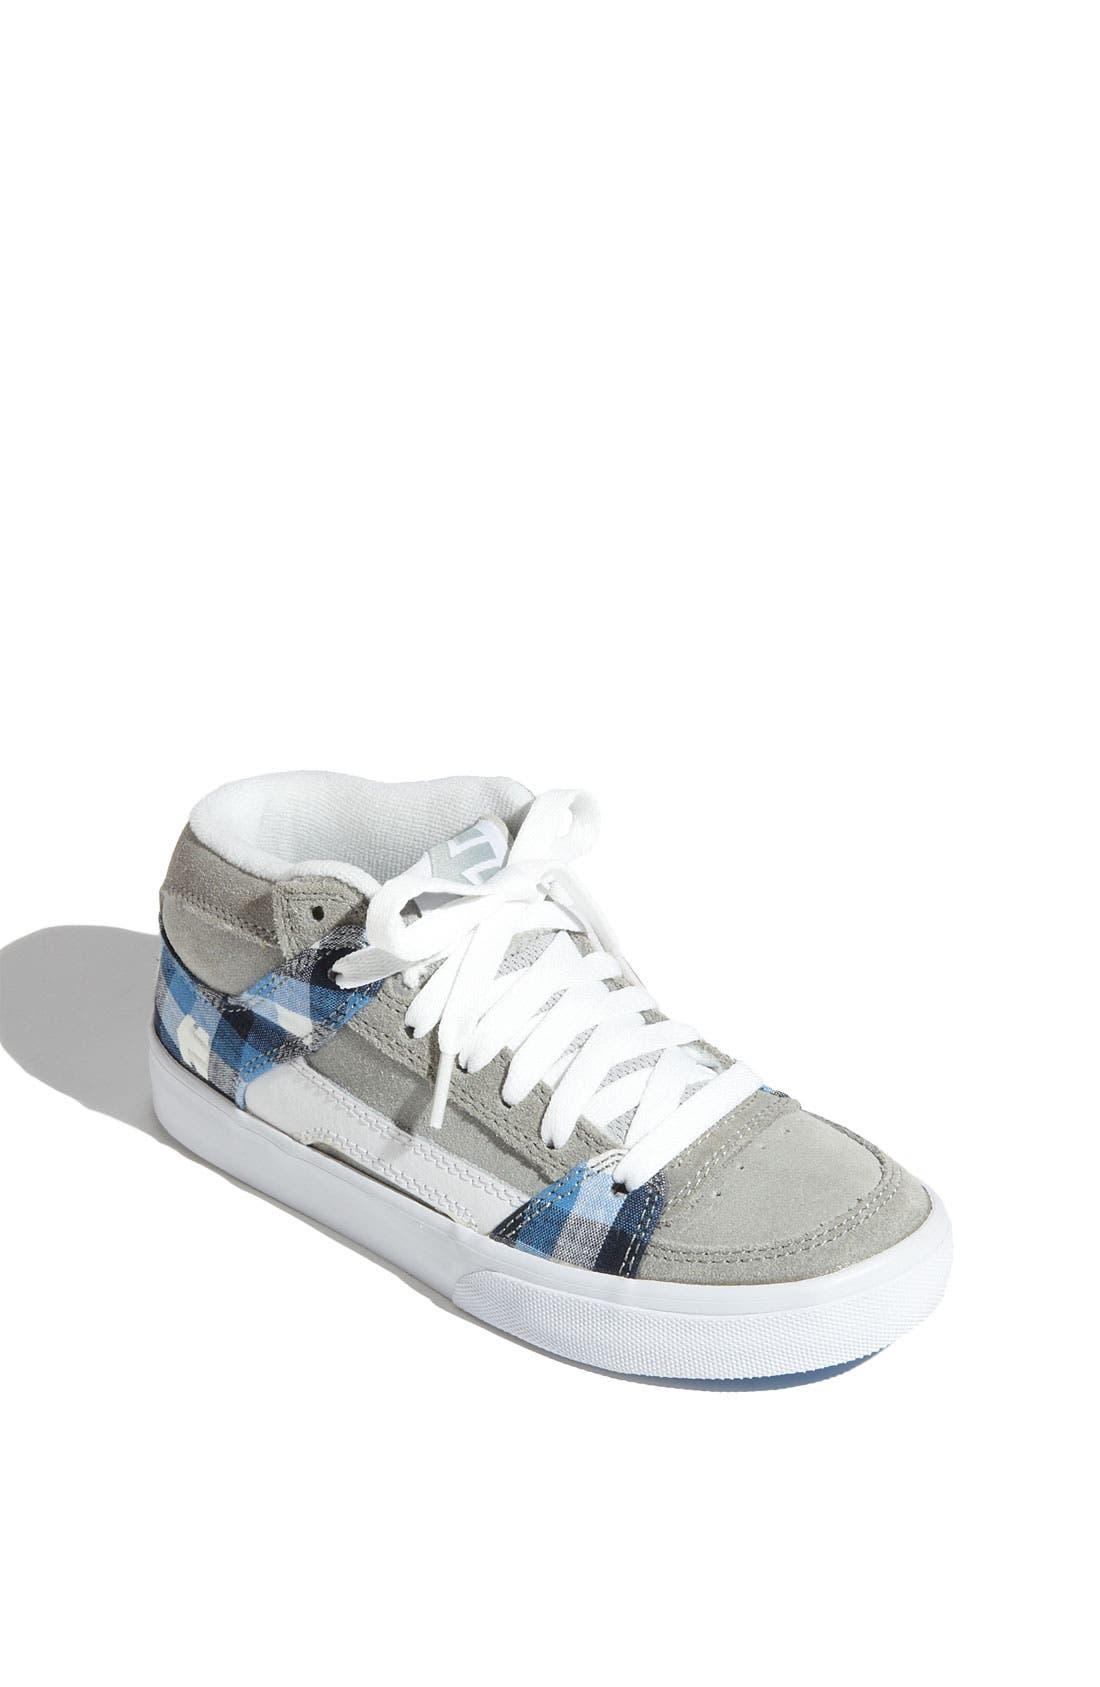 Main Image - Etnies 'RVM - Autism Speaks' Skate Shoe (Toddler, Little Kid & Big Kid)